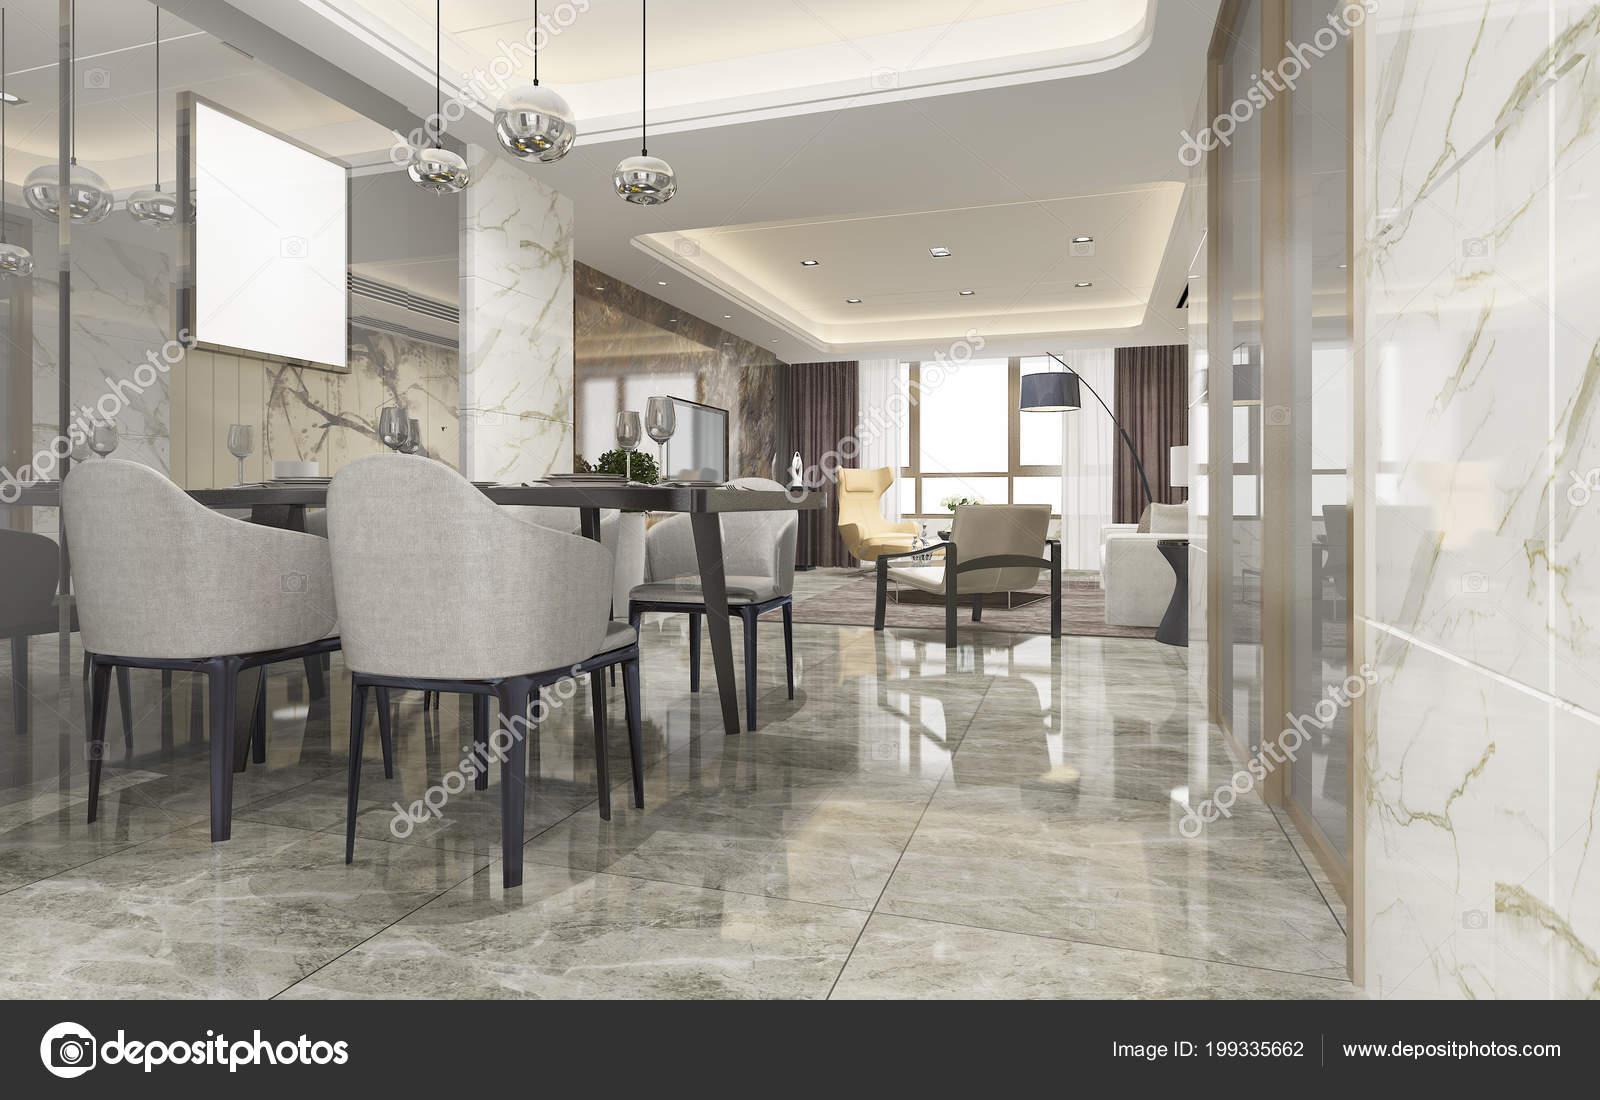 Luxe Woonkamer Inrichting : Rendering moderne eetkamer woonkamer met luxe inrichting u2014 stockfoto